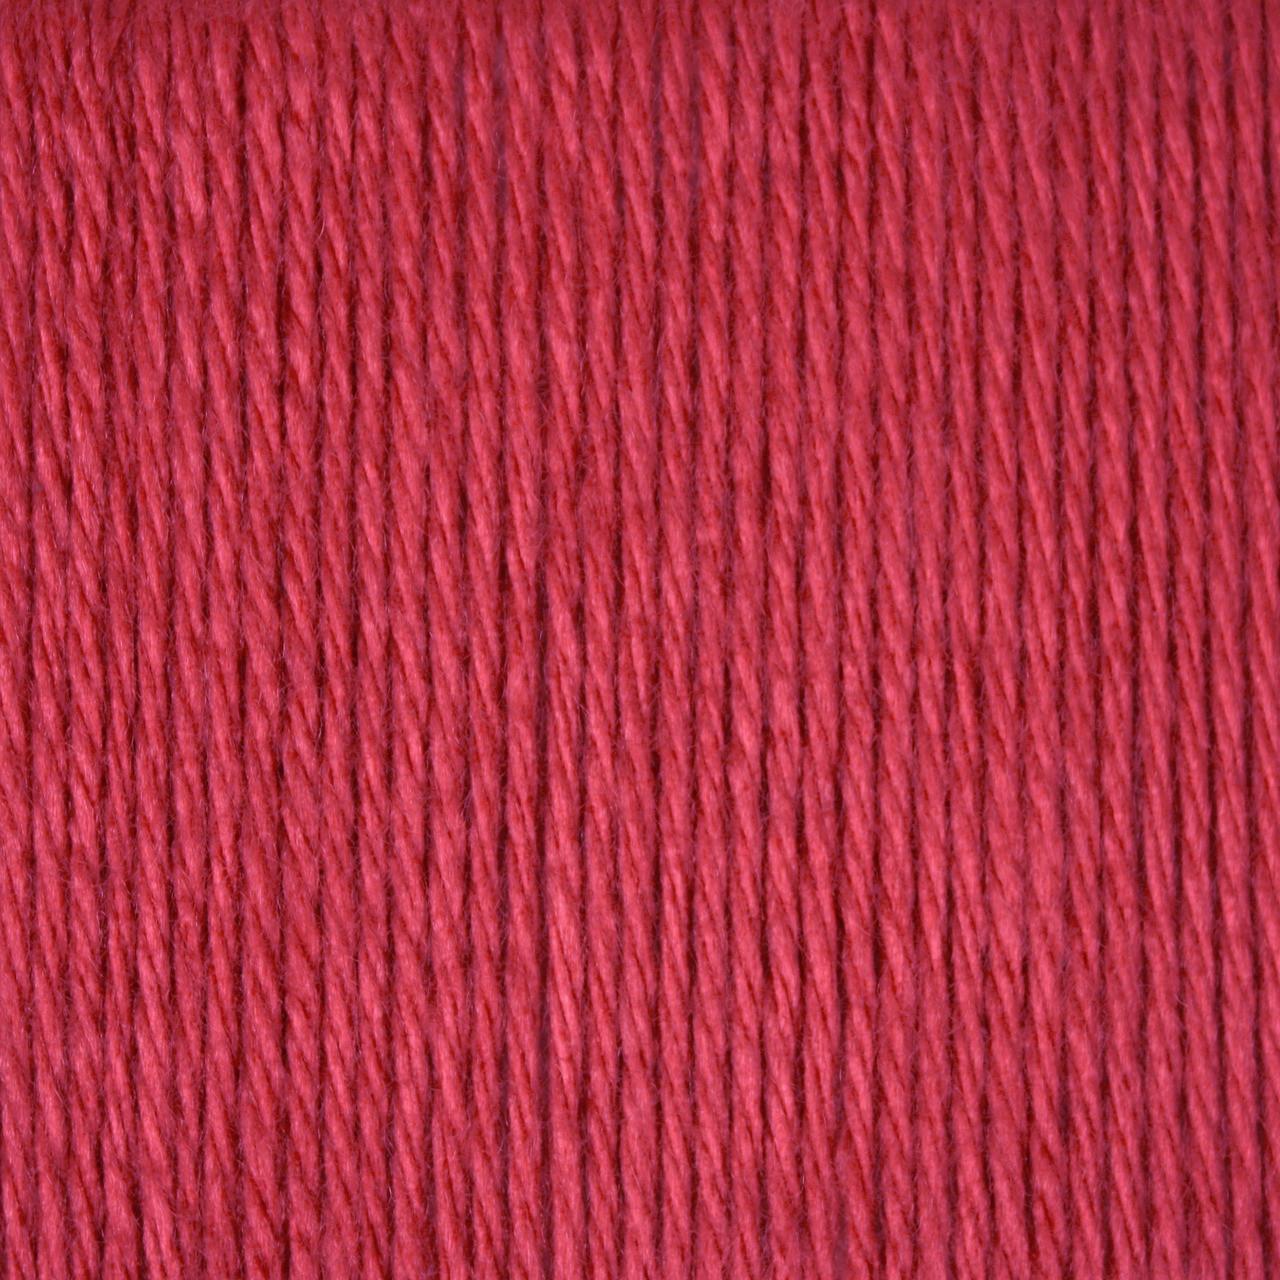 Bernat Rouge Satin Yarn 4 Medium Free Shipping At